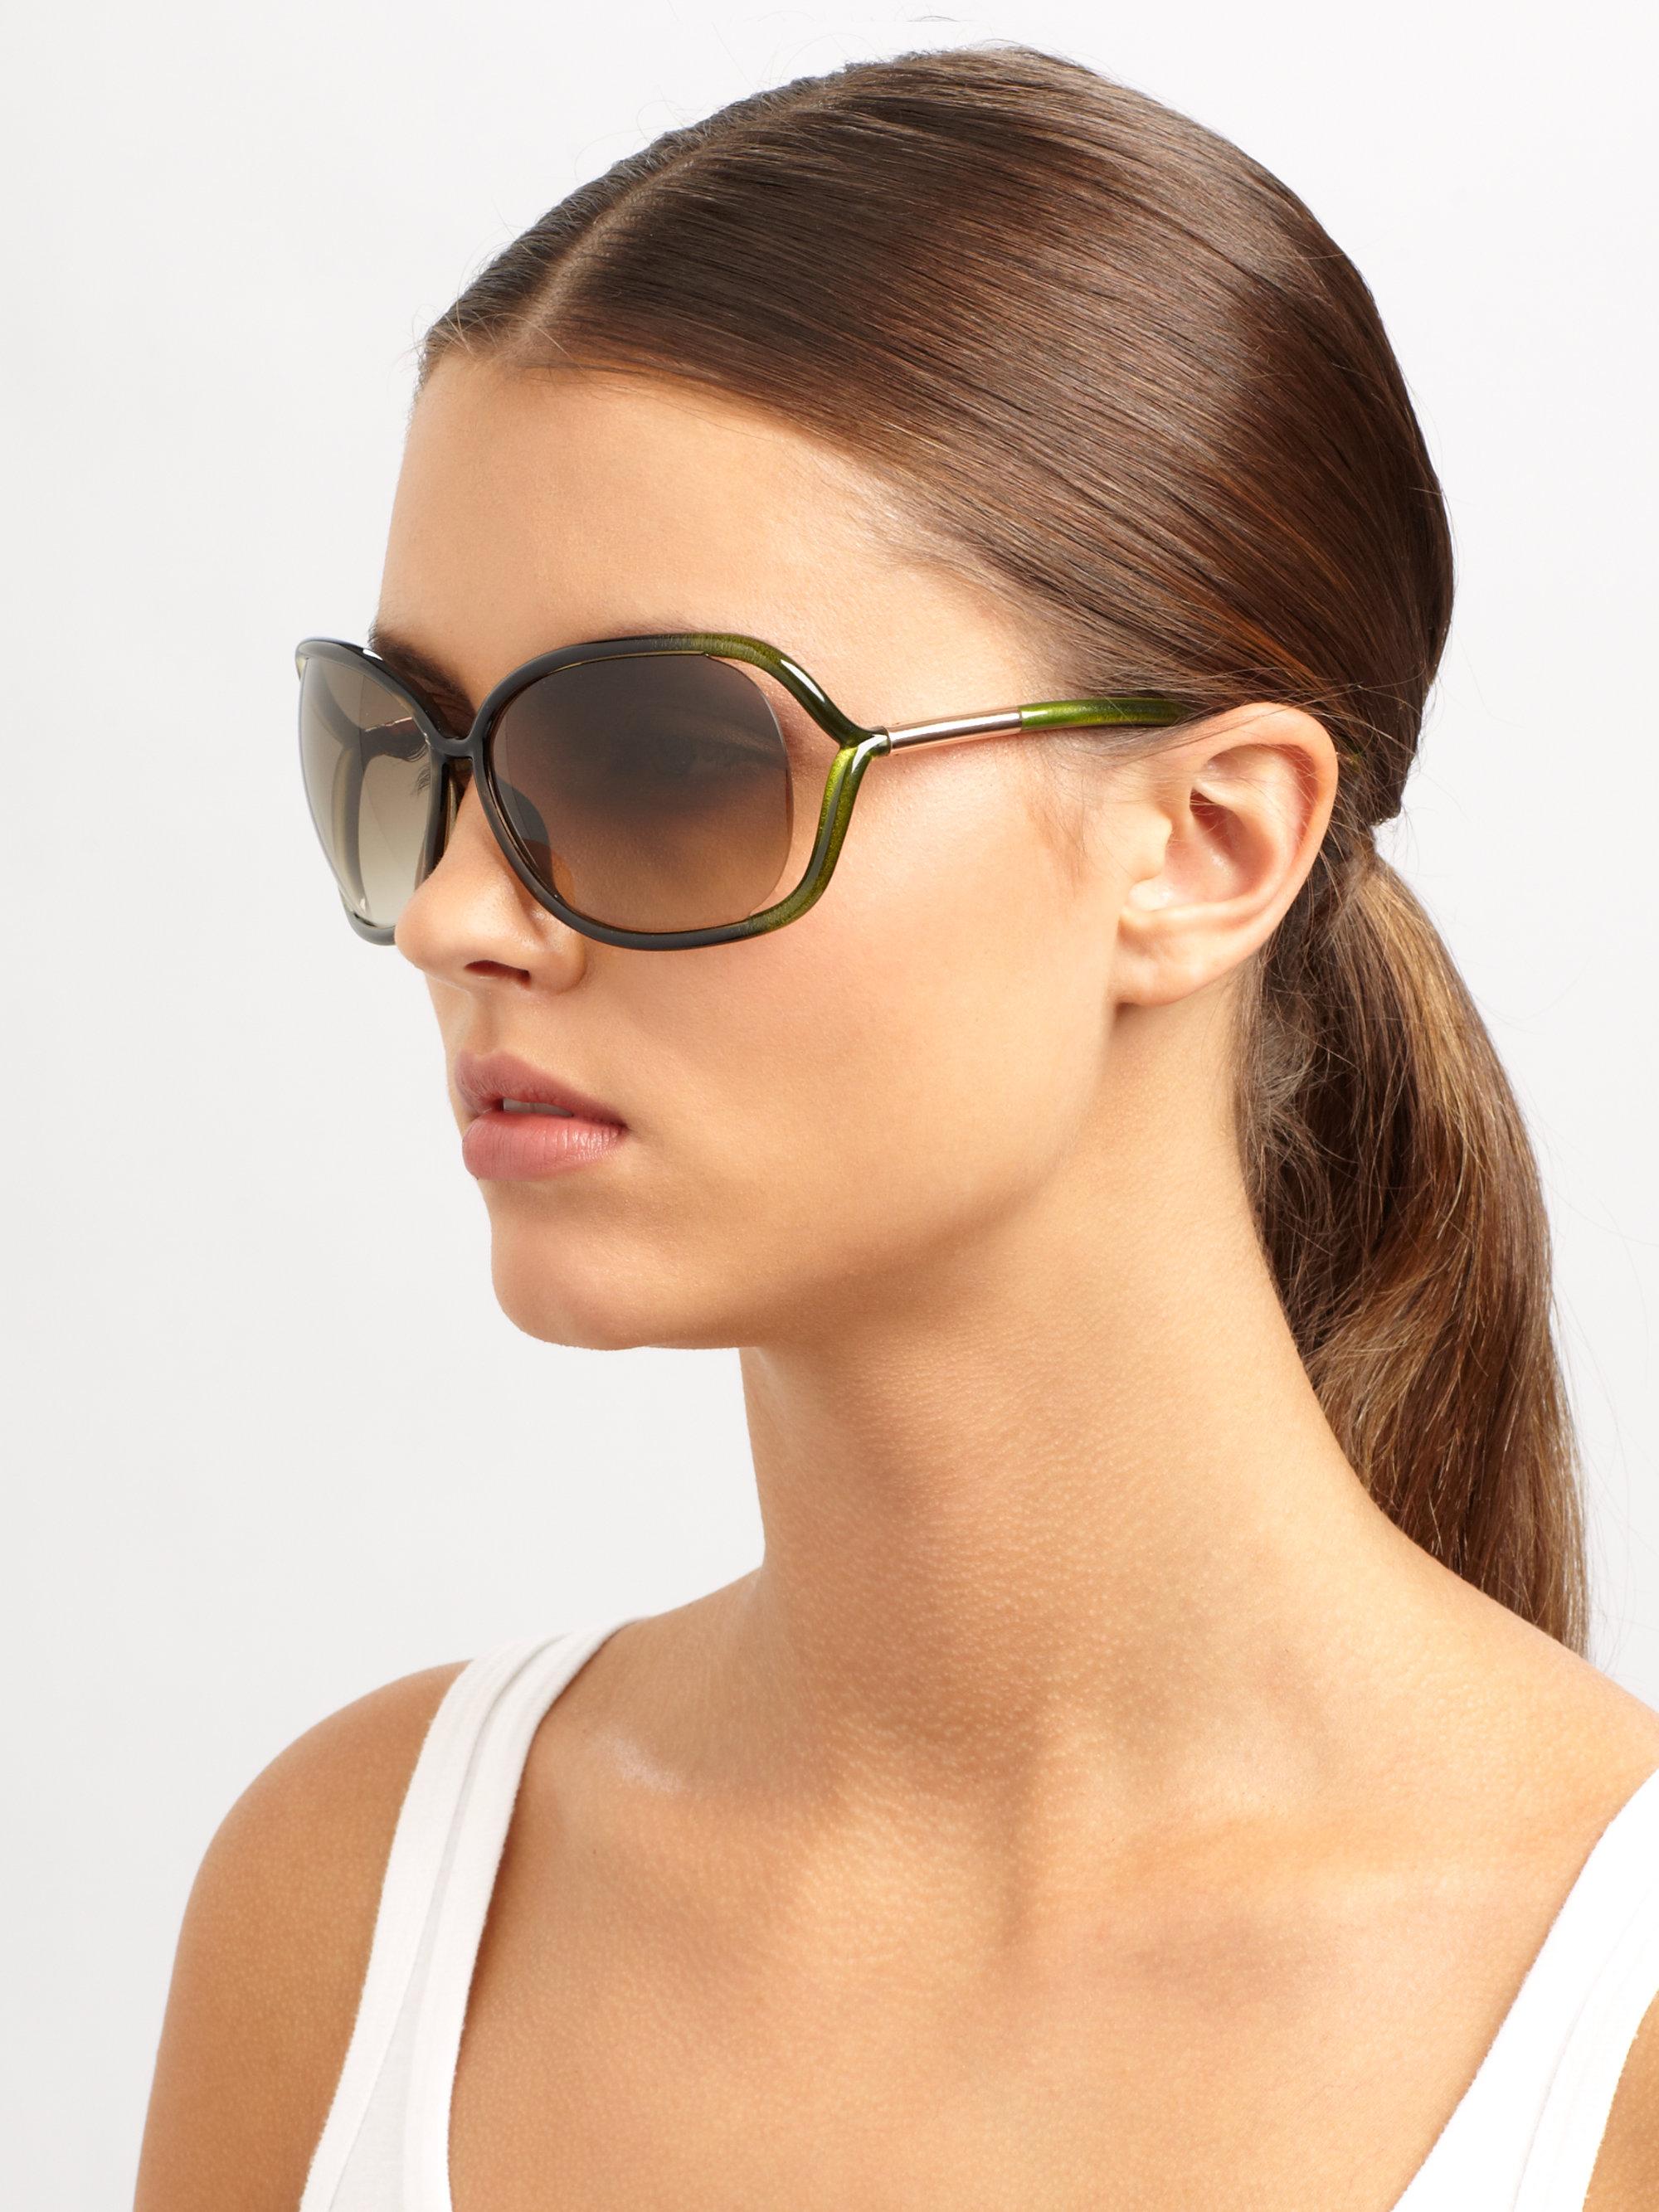 68mm Ford Oval Raquel Green Tom Sunglasses dCxoBe